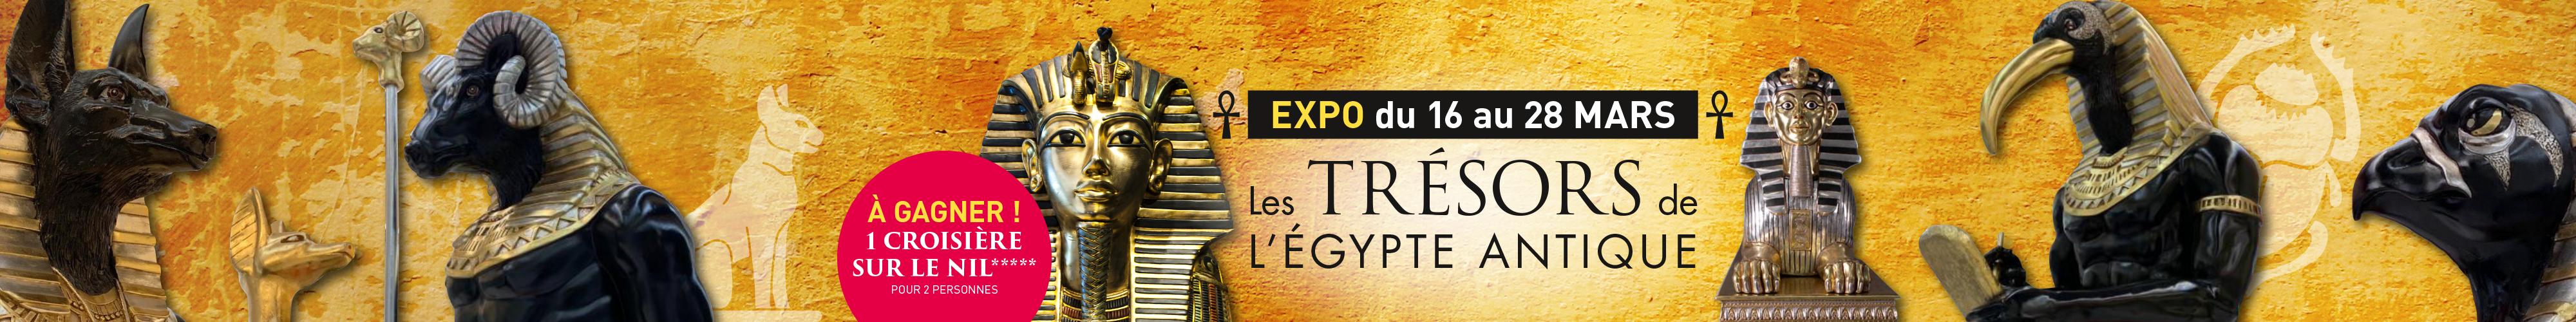 07893-EGYPTE-ANTIQUE_SLIDE